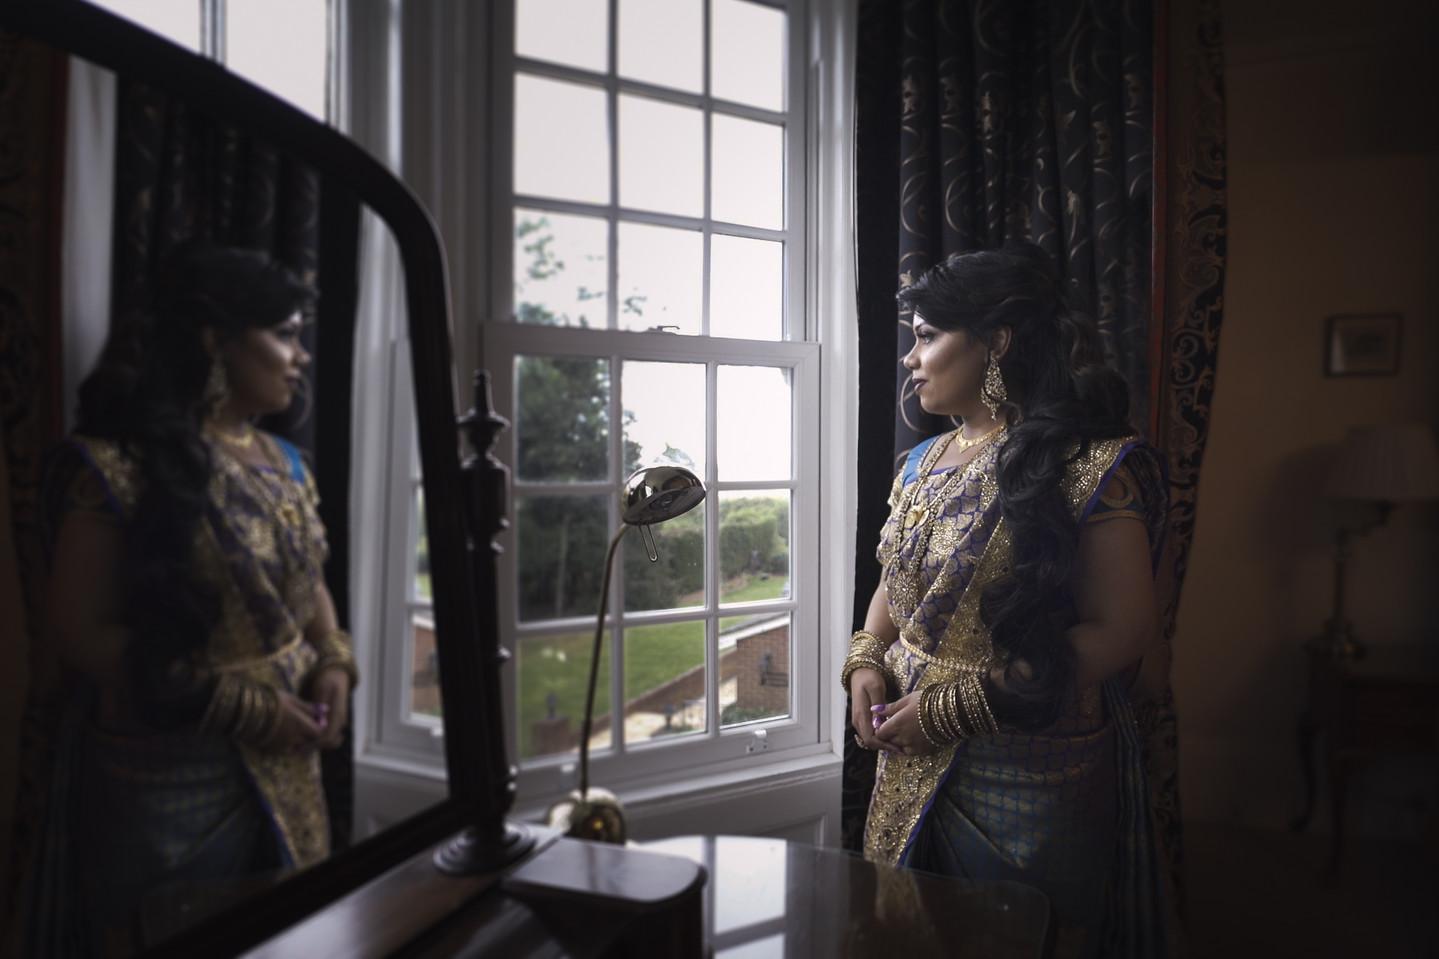 Hempstead House - Looking through Window